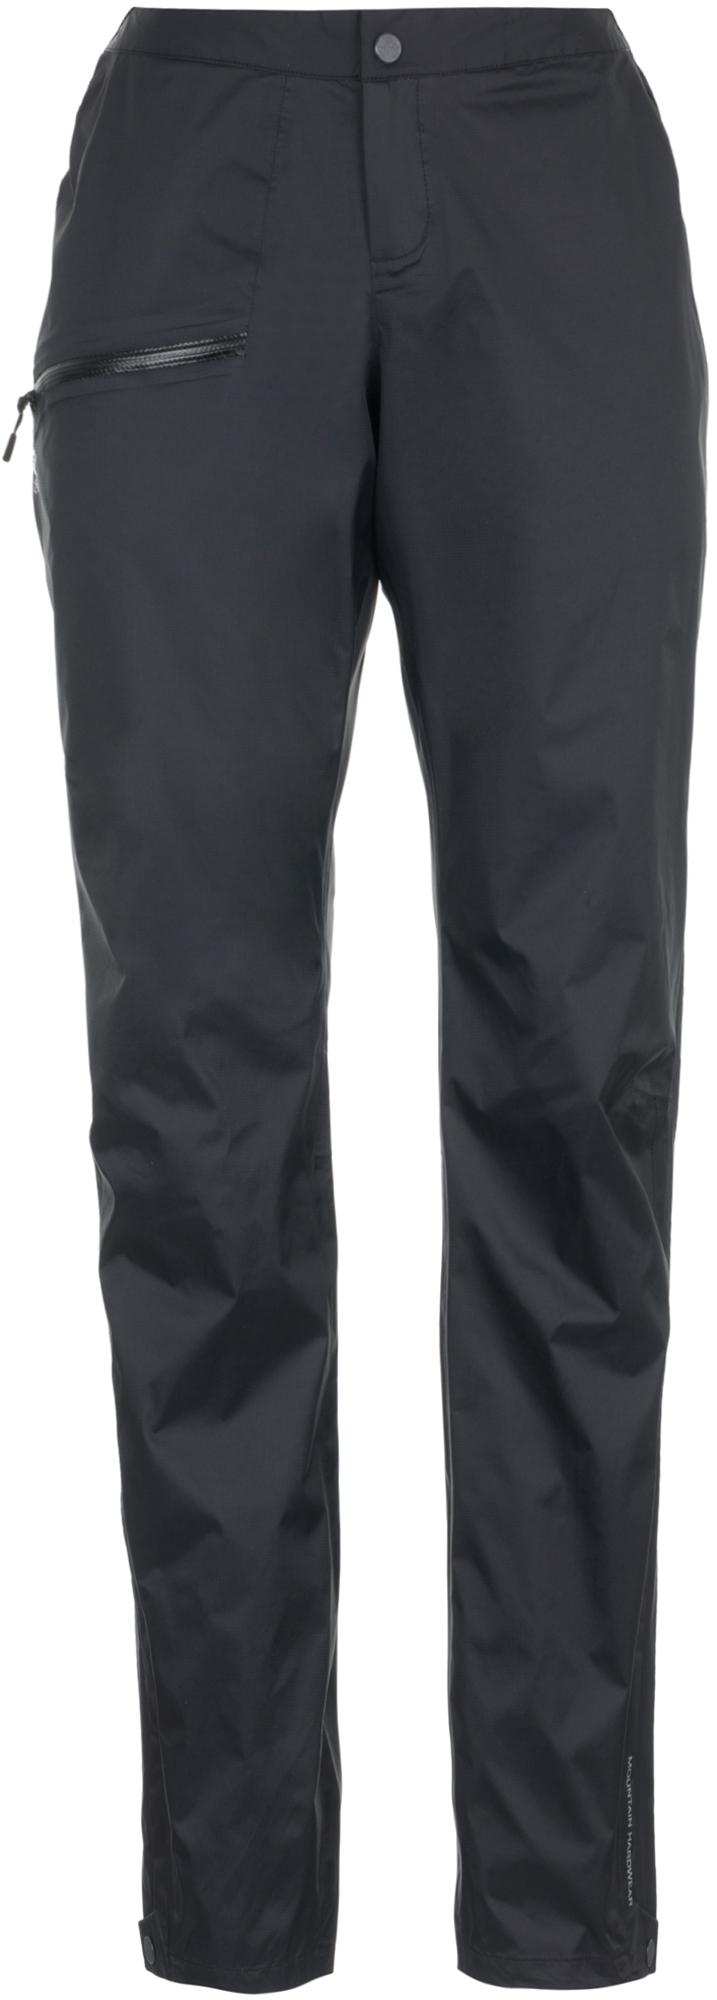 Mountain Hardwear Брюки женские Mountain Hardwear Exponent женские брюки лэйт темный размер 56